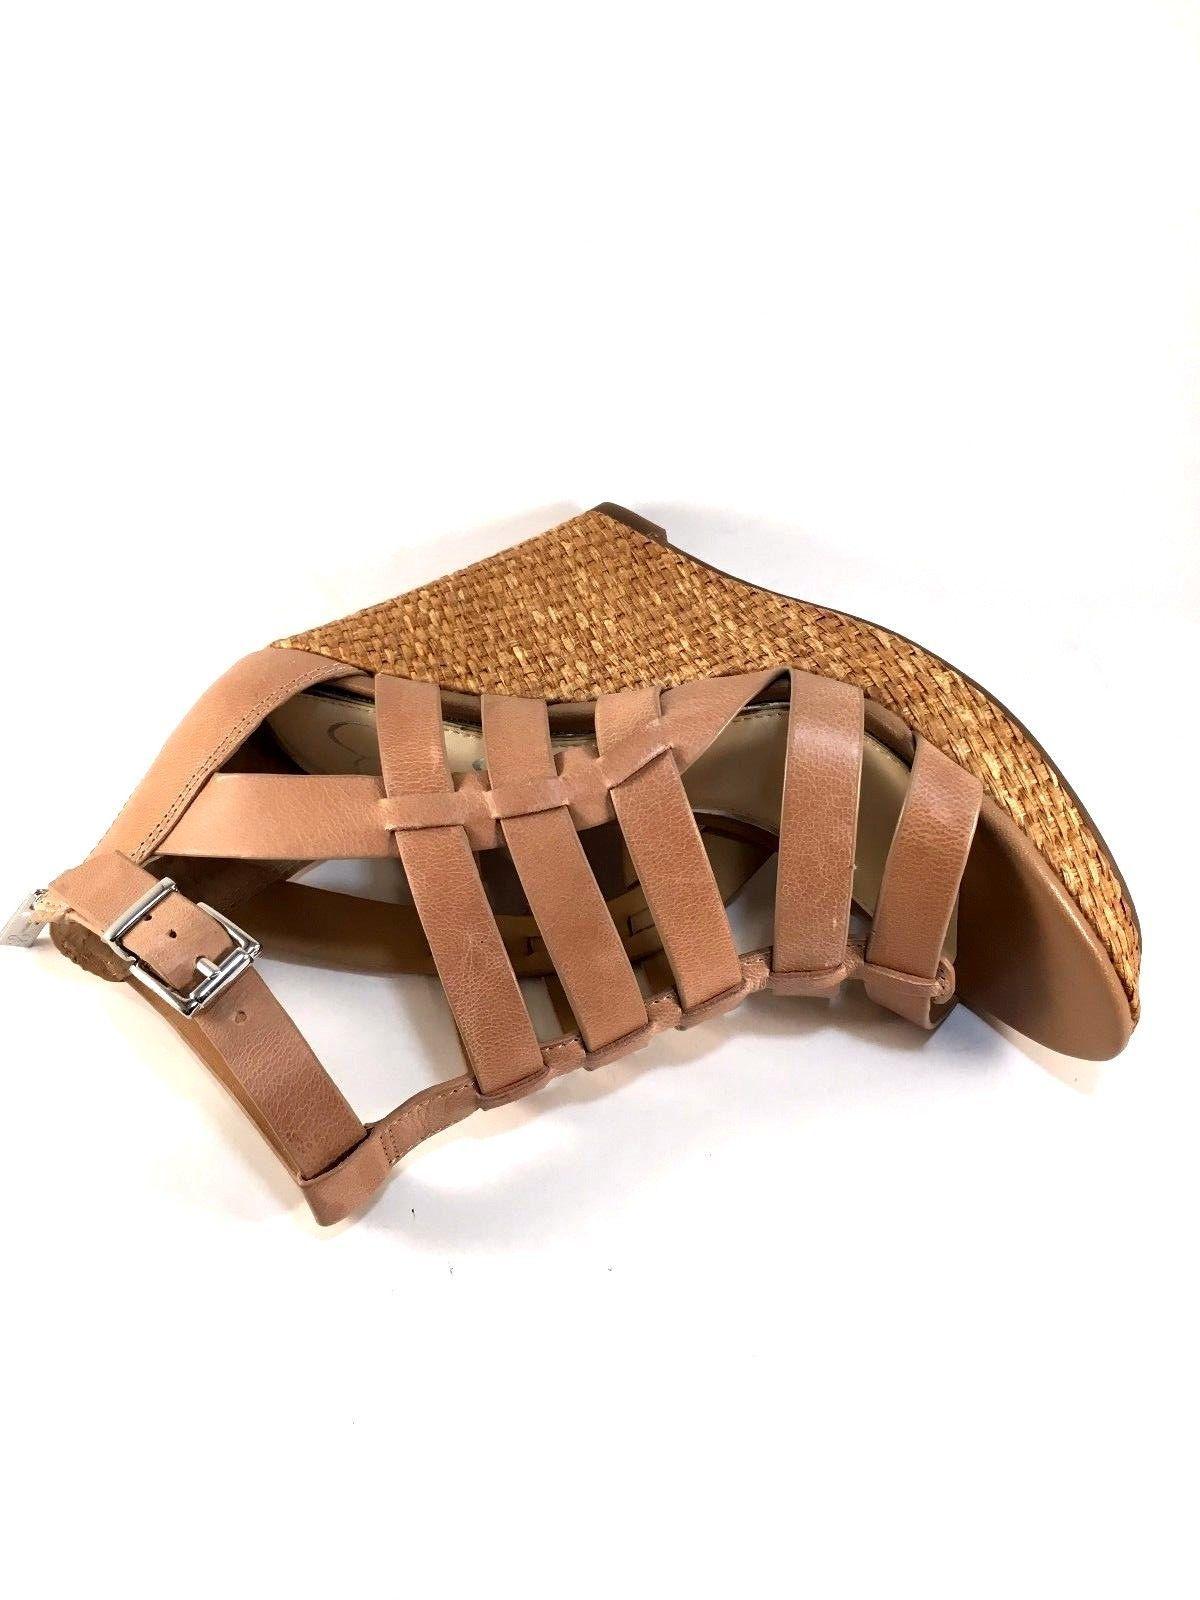 Jessica Simpson Jeyne Leather Platform Wedge Closed Back Sandals Choose Sz/Color